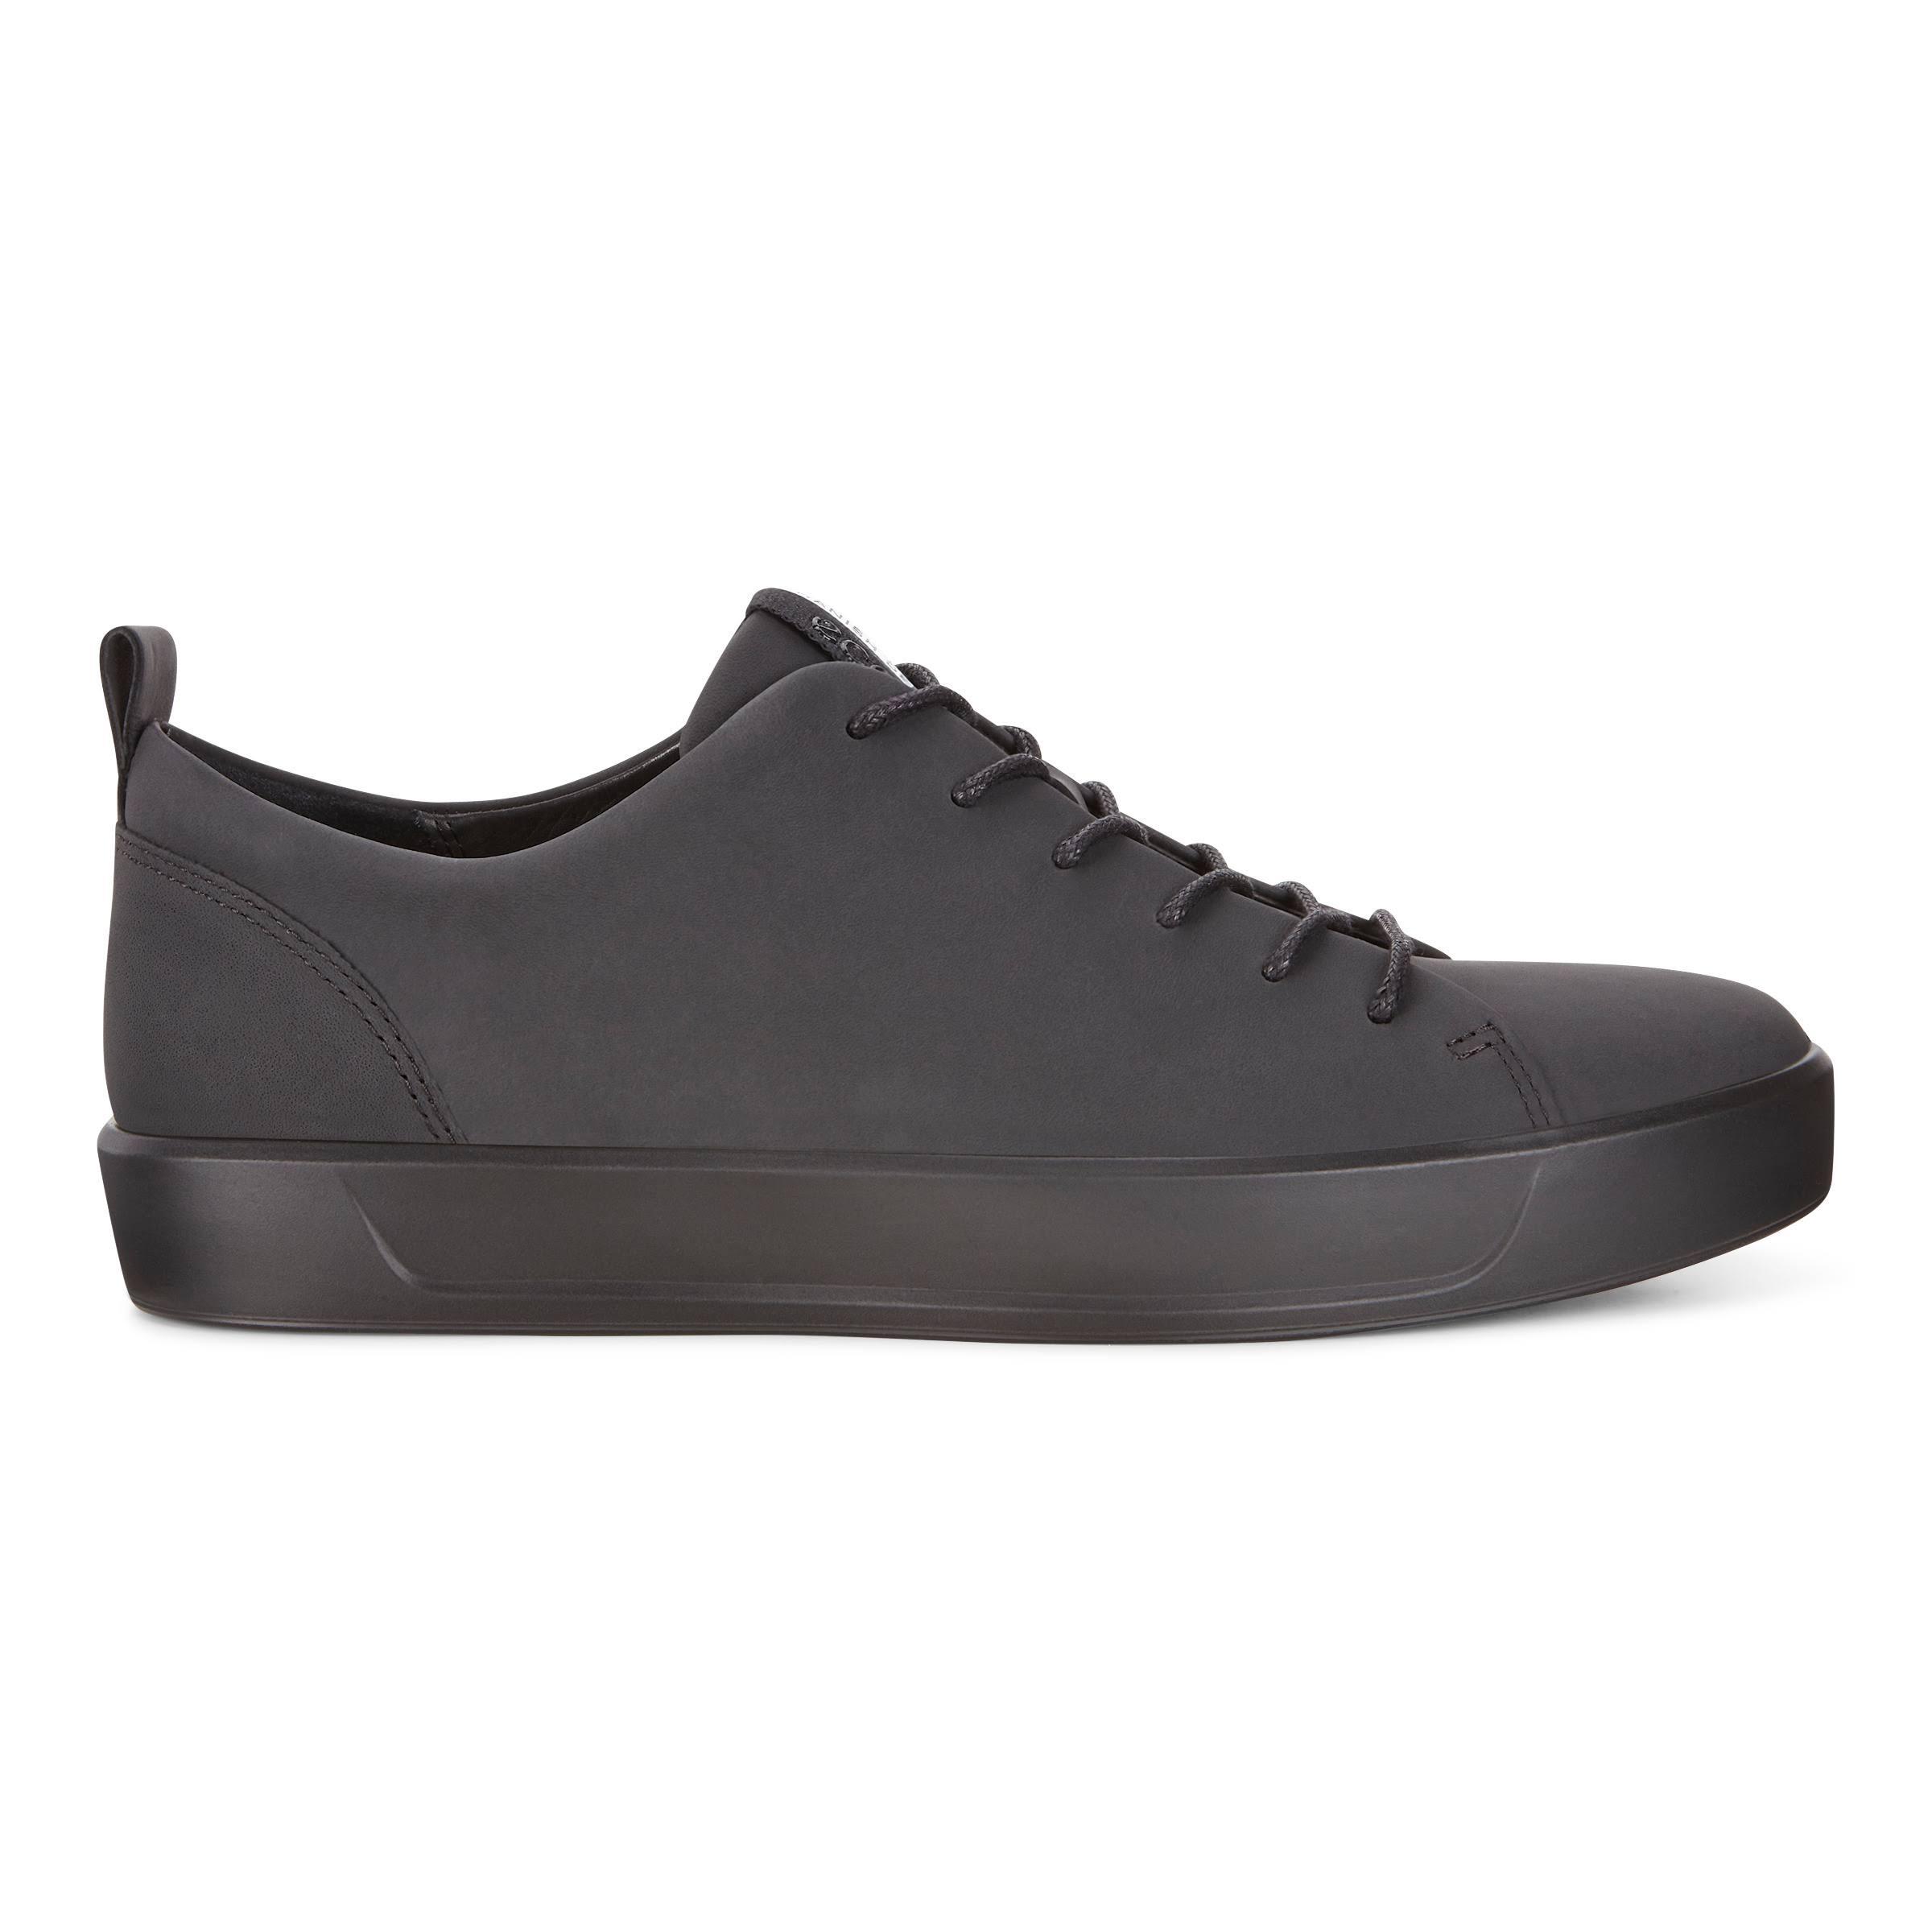 Soft Stringata Sneaker 8 41m Ecco Da UomoNeraTaglia LVUpMGSqz